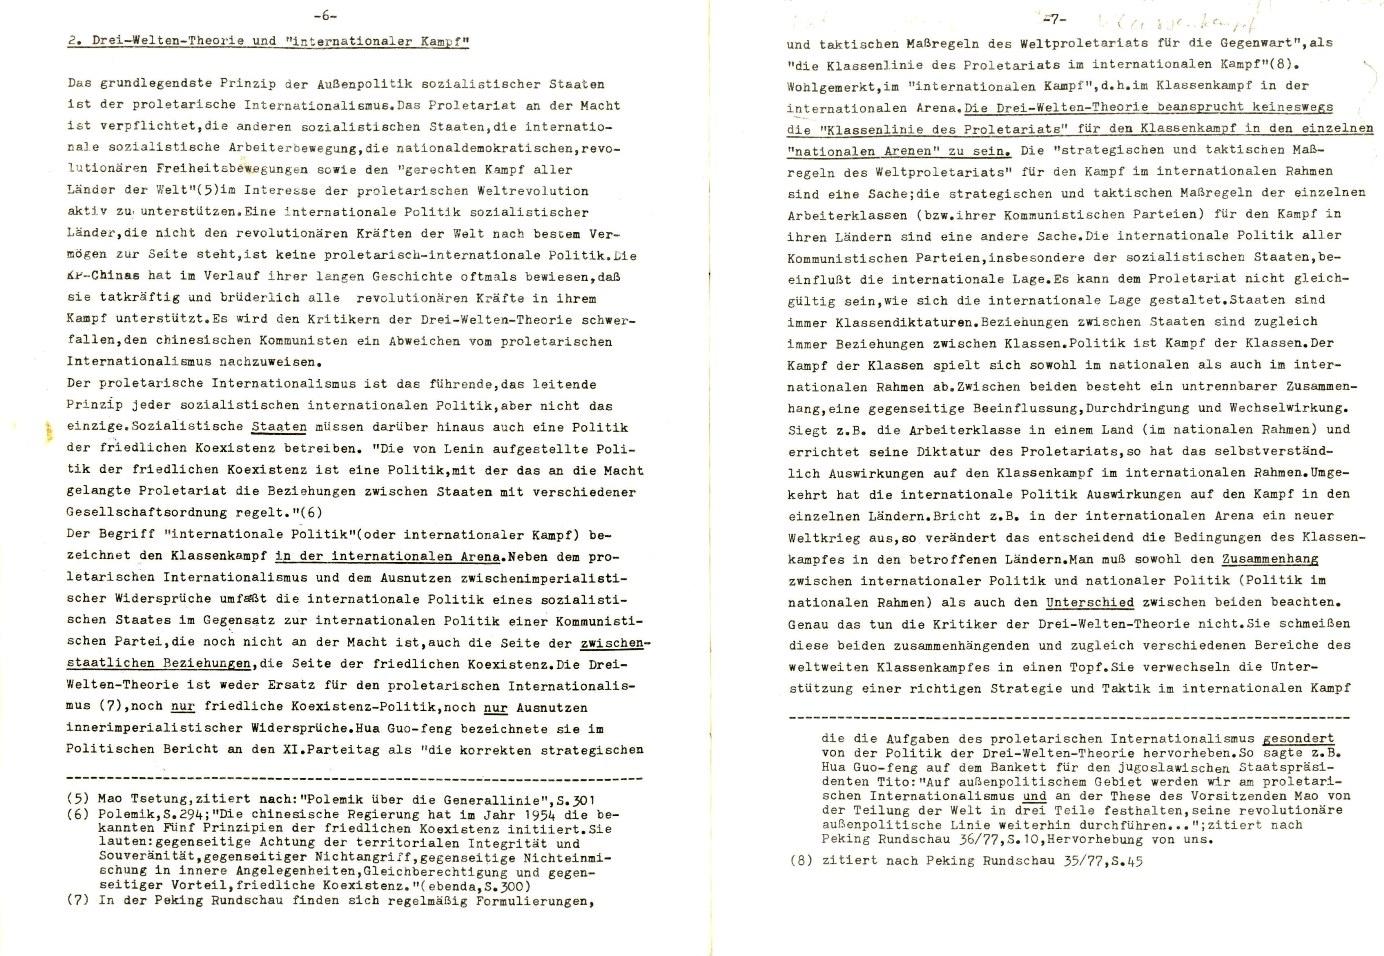 Muenchen_Kampf_dem_Revisionismus_1978_04_05_05